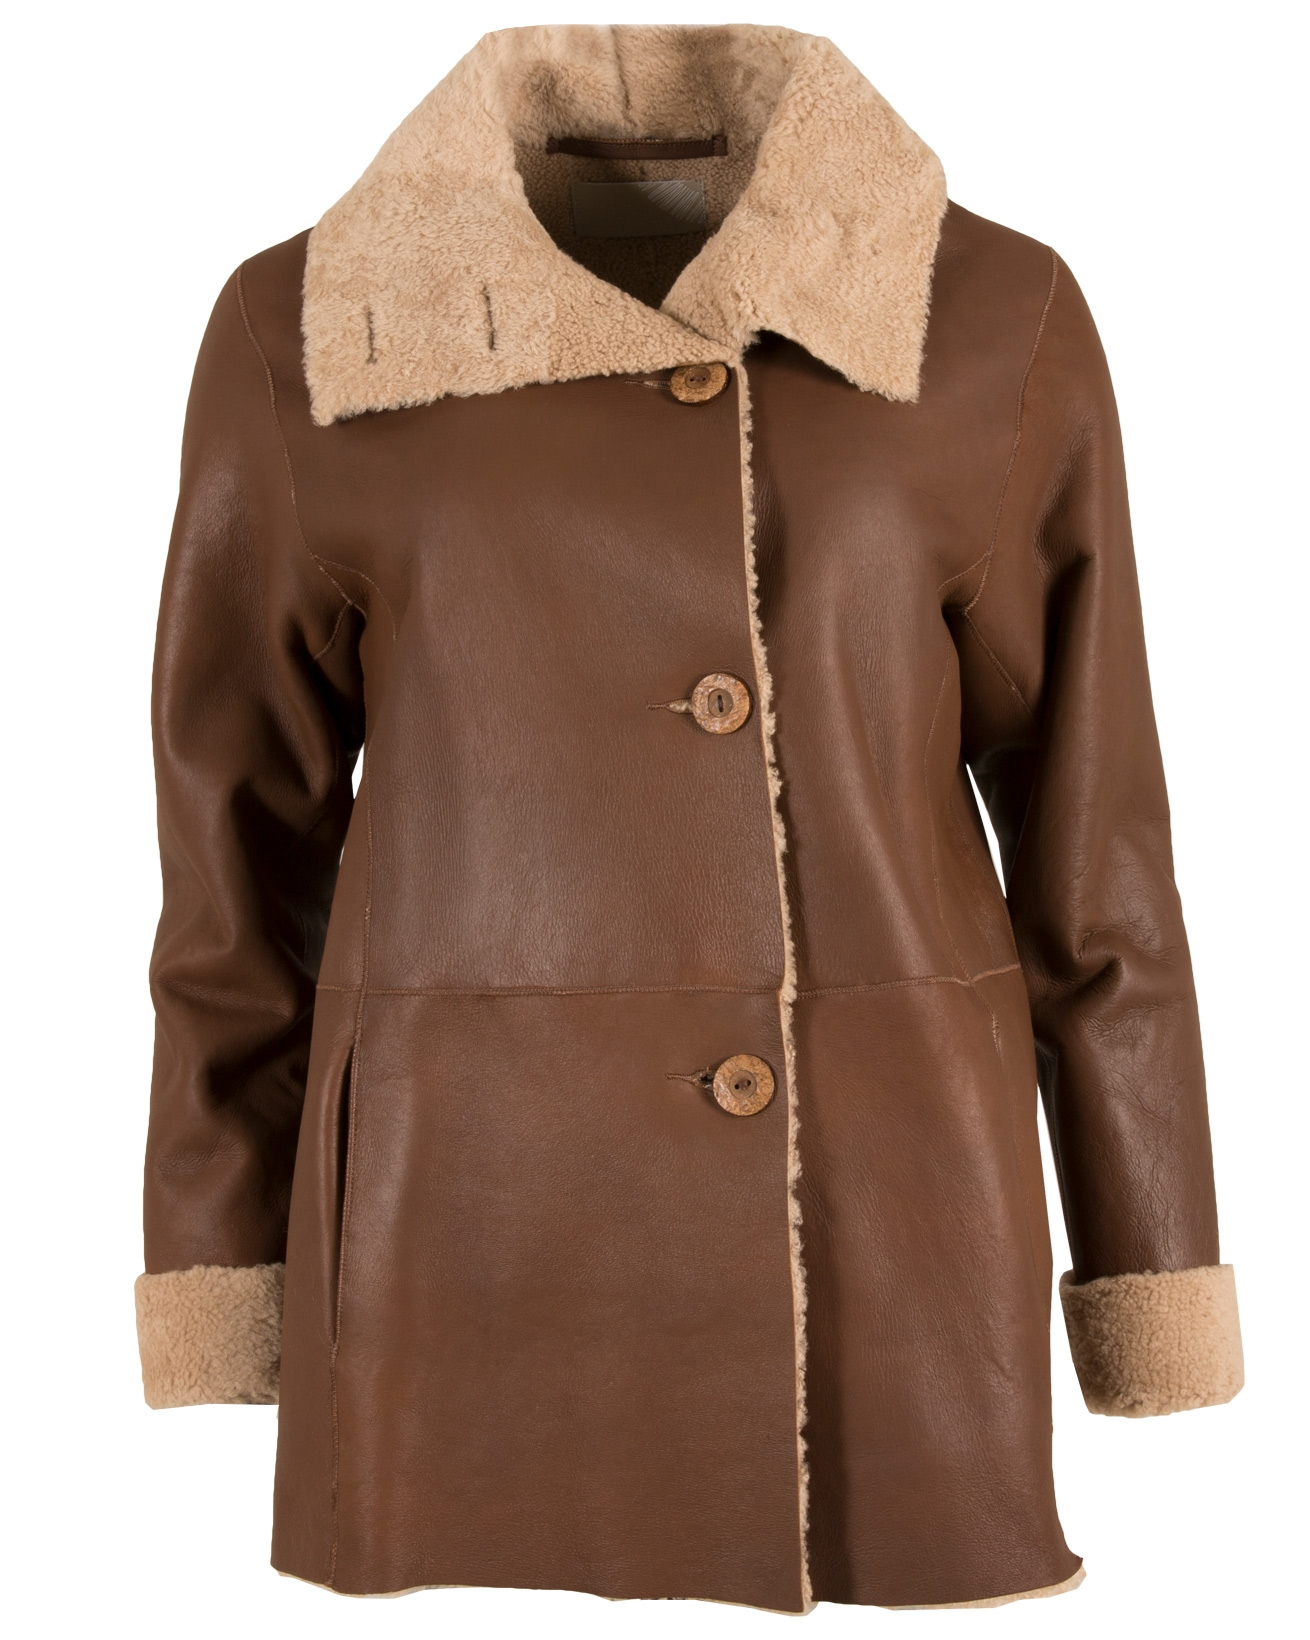 Vintage Box Sheepskin Coat - Size 10 - Tan - 644